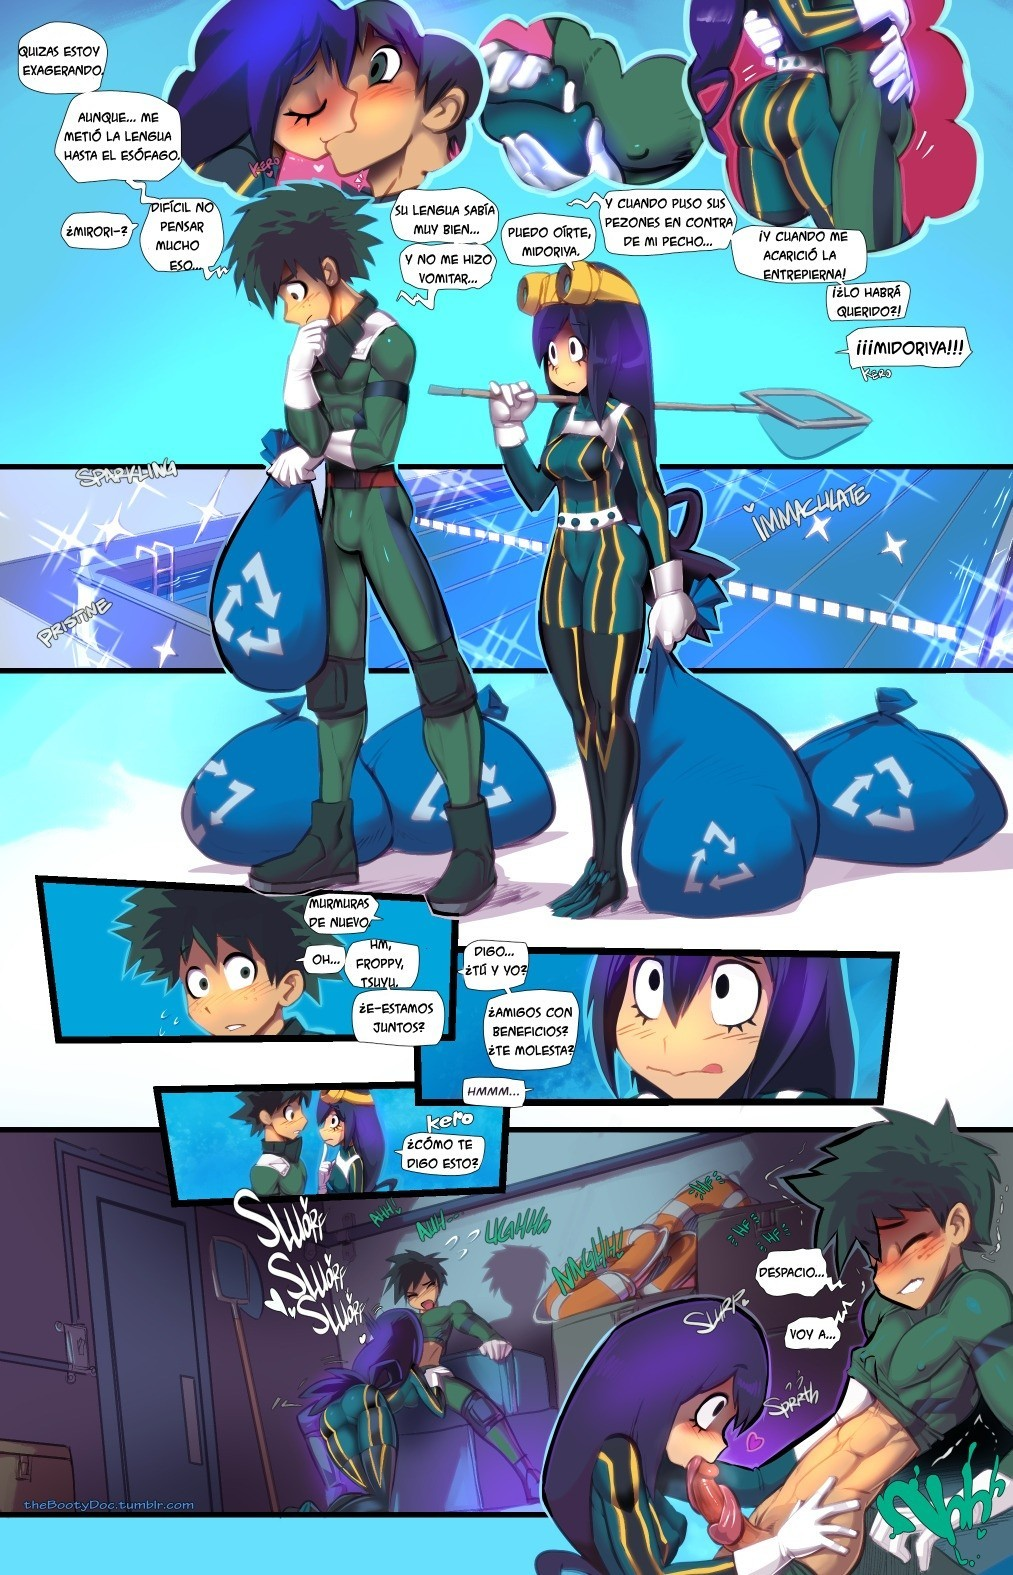 DEKU and FROPPY Smash!